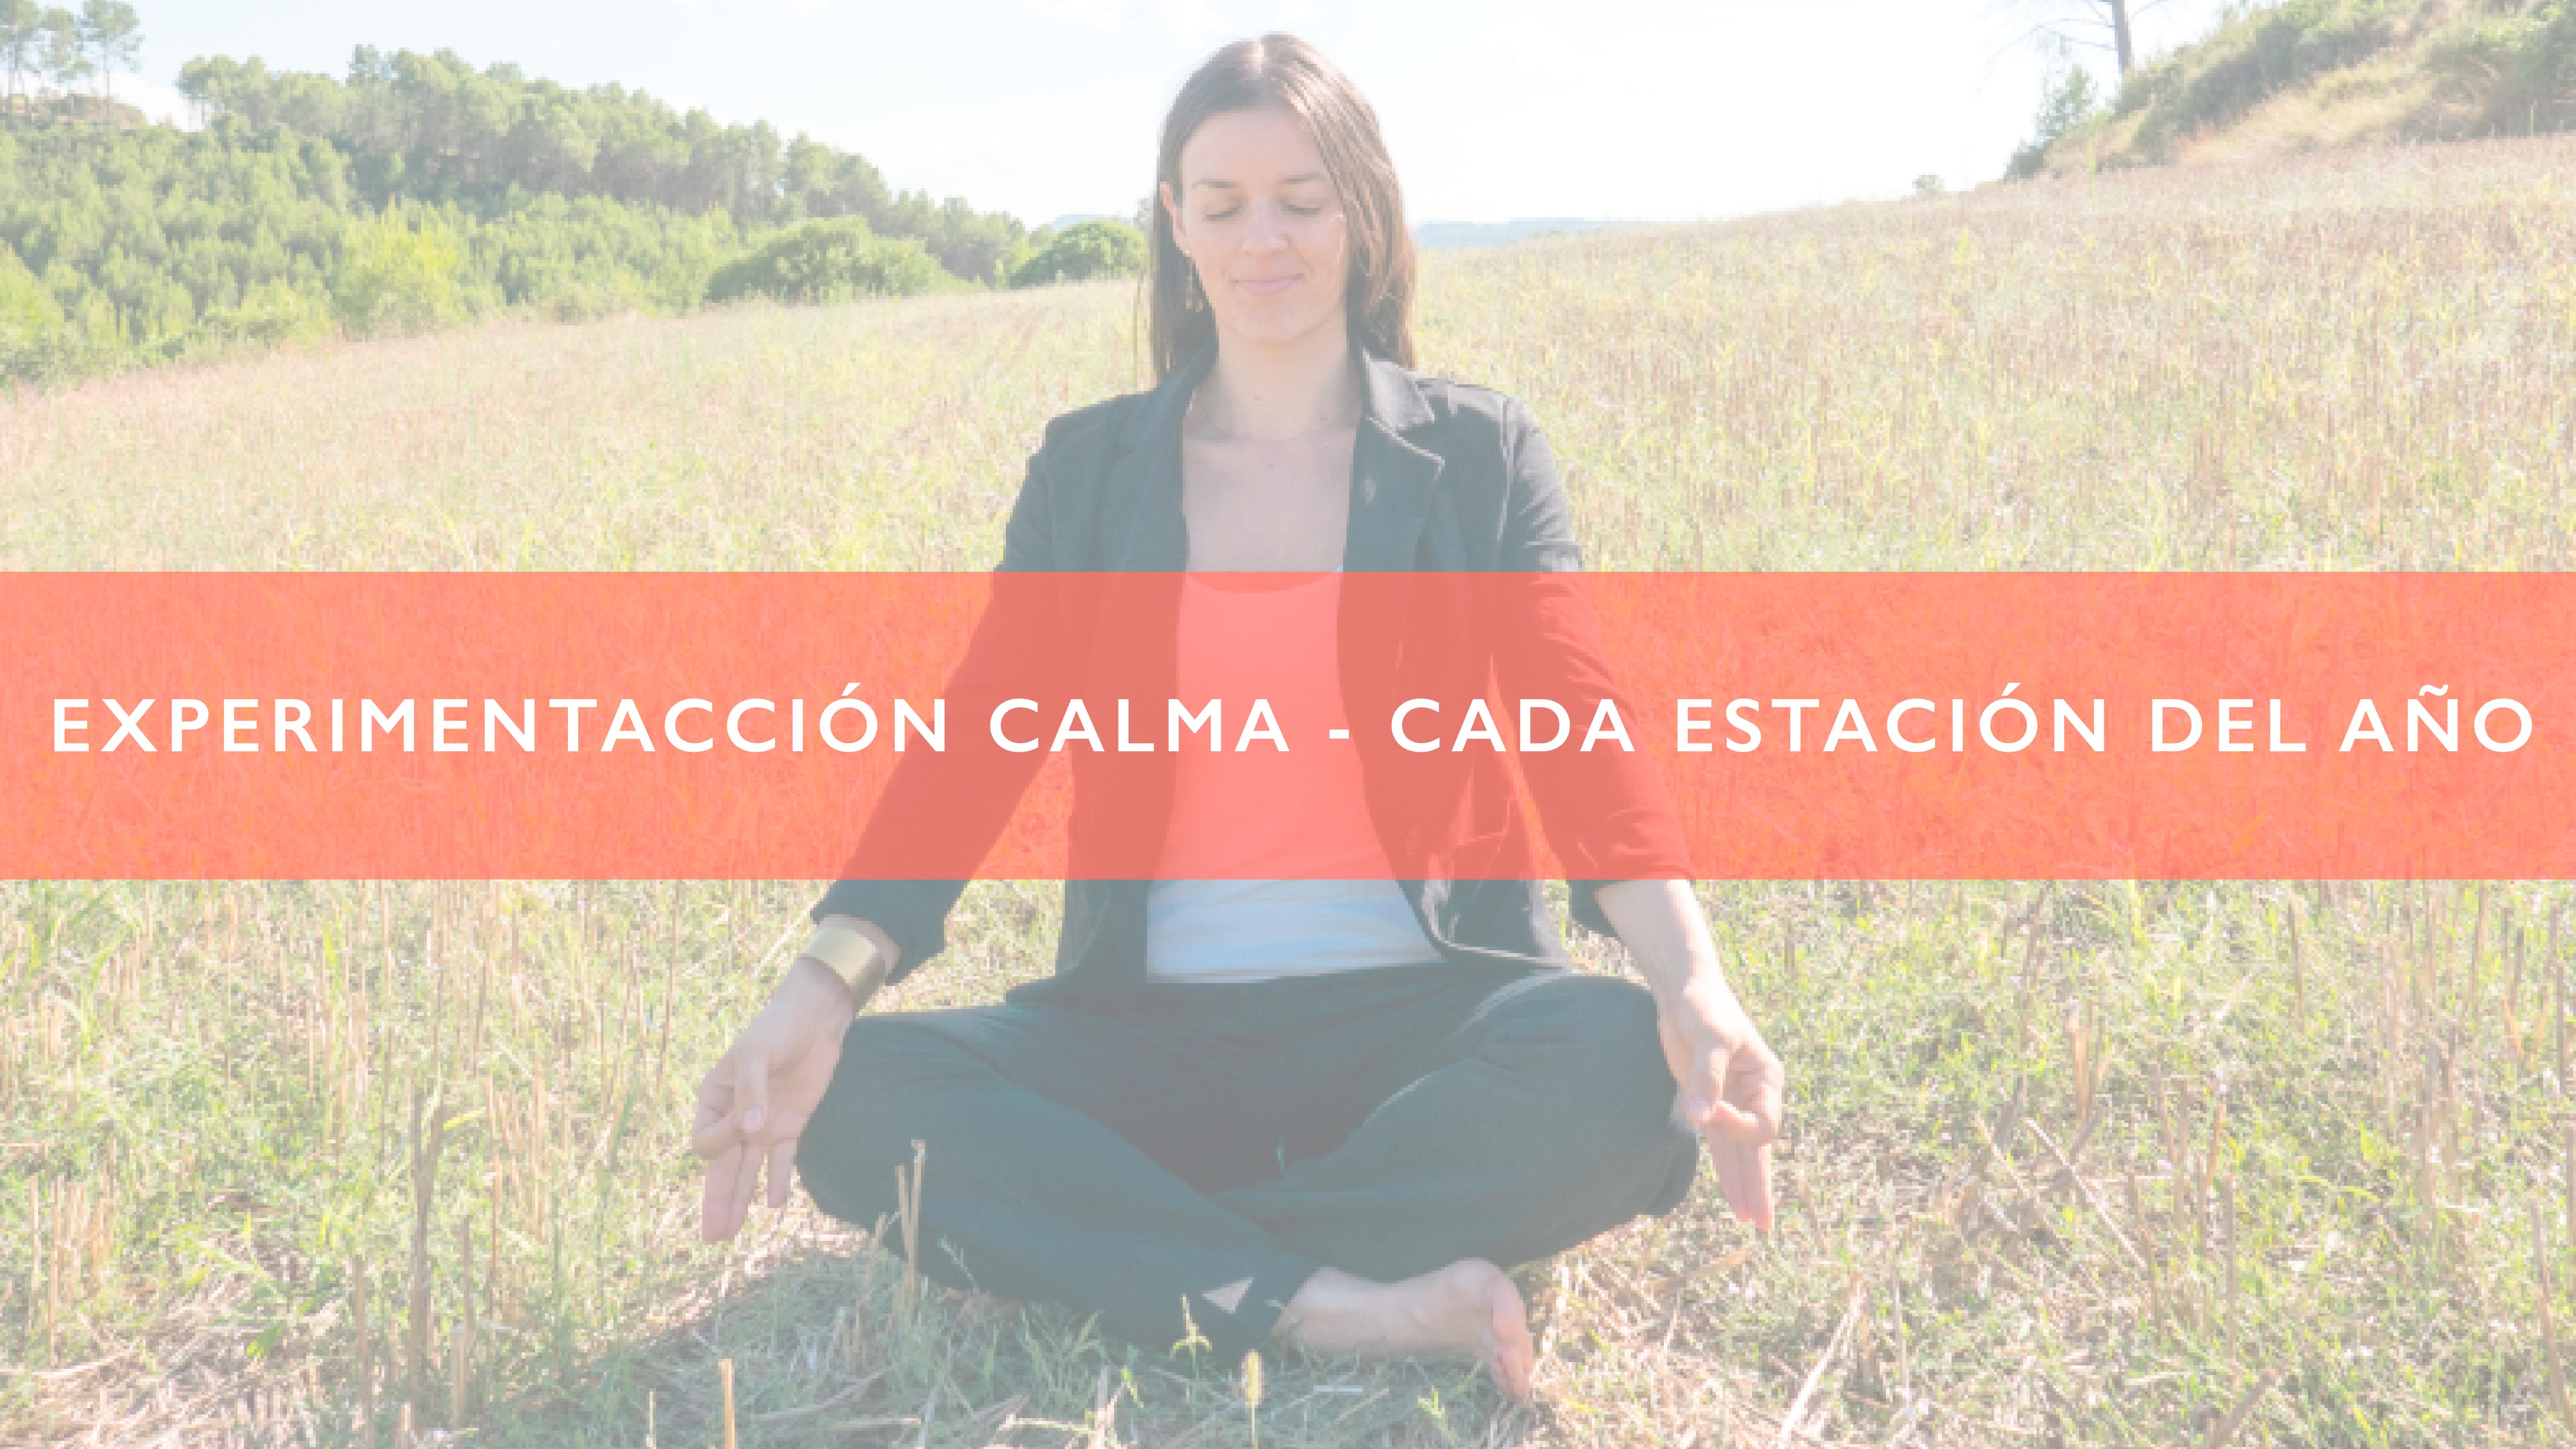 experimentaccion calma evento yoga meditacion superacion personal